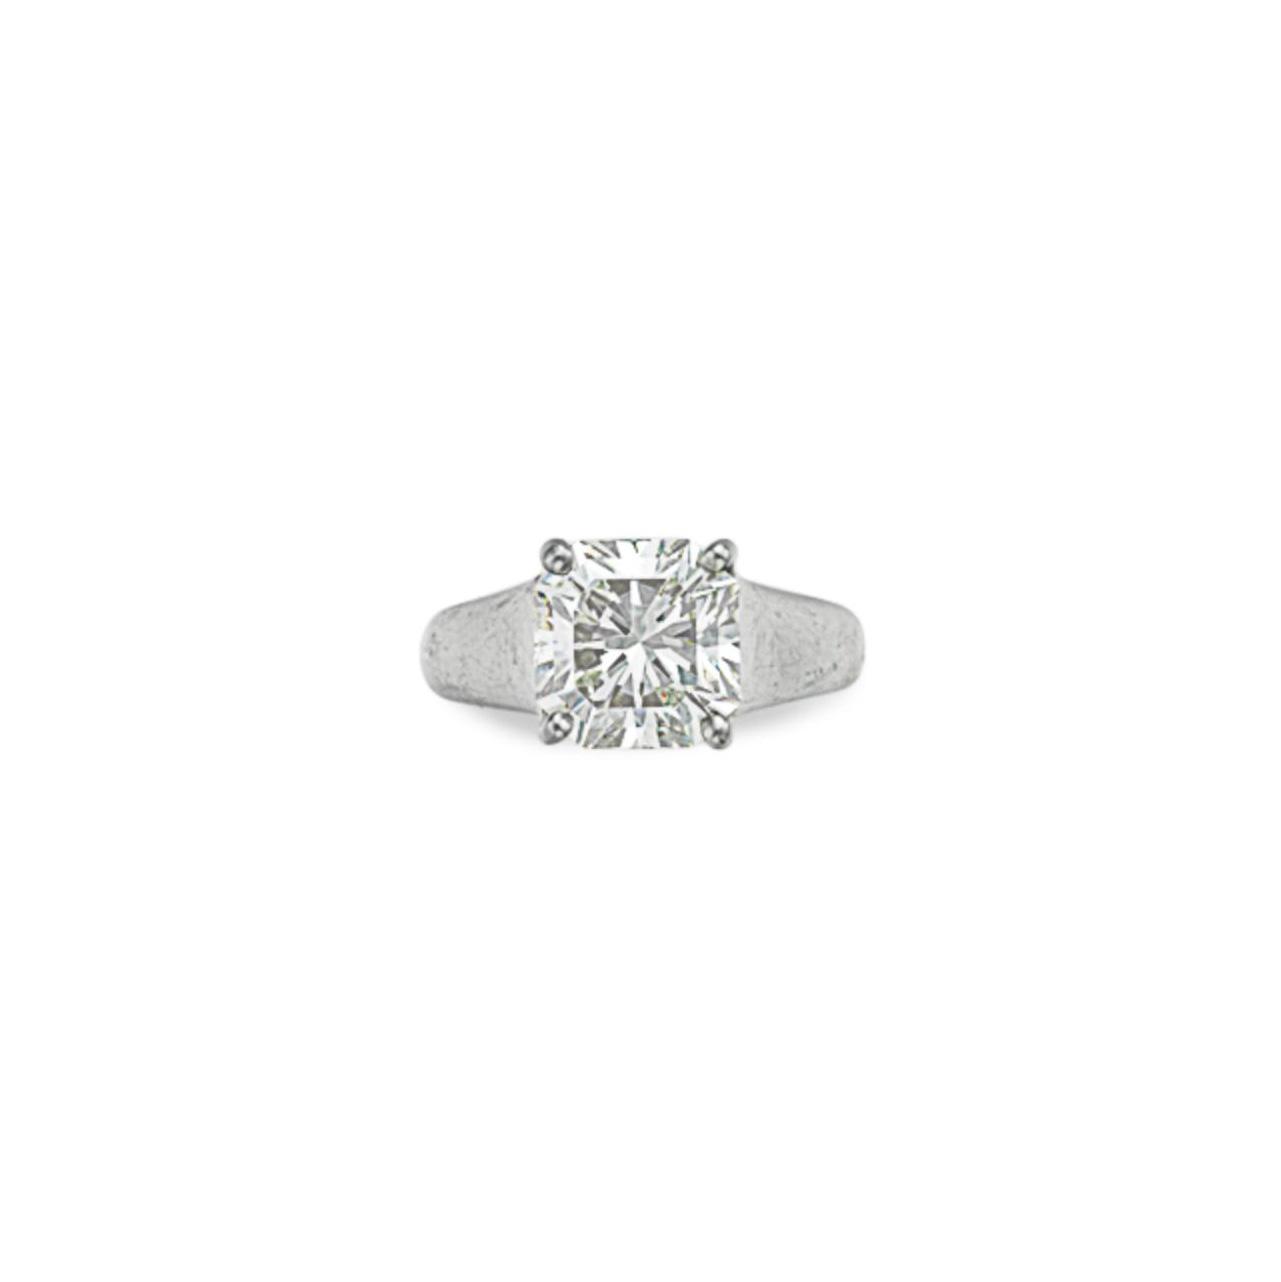 A DIAMOND 'LUCIDA' RING, BY TI